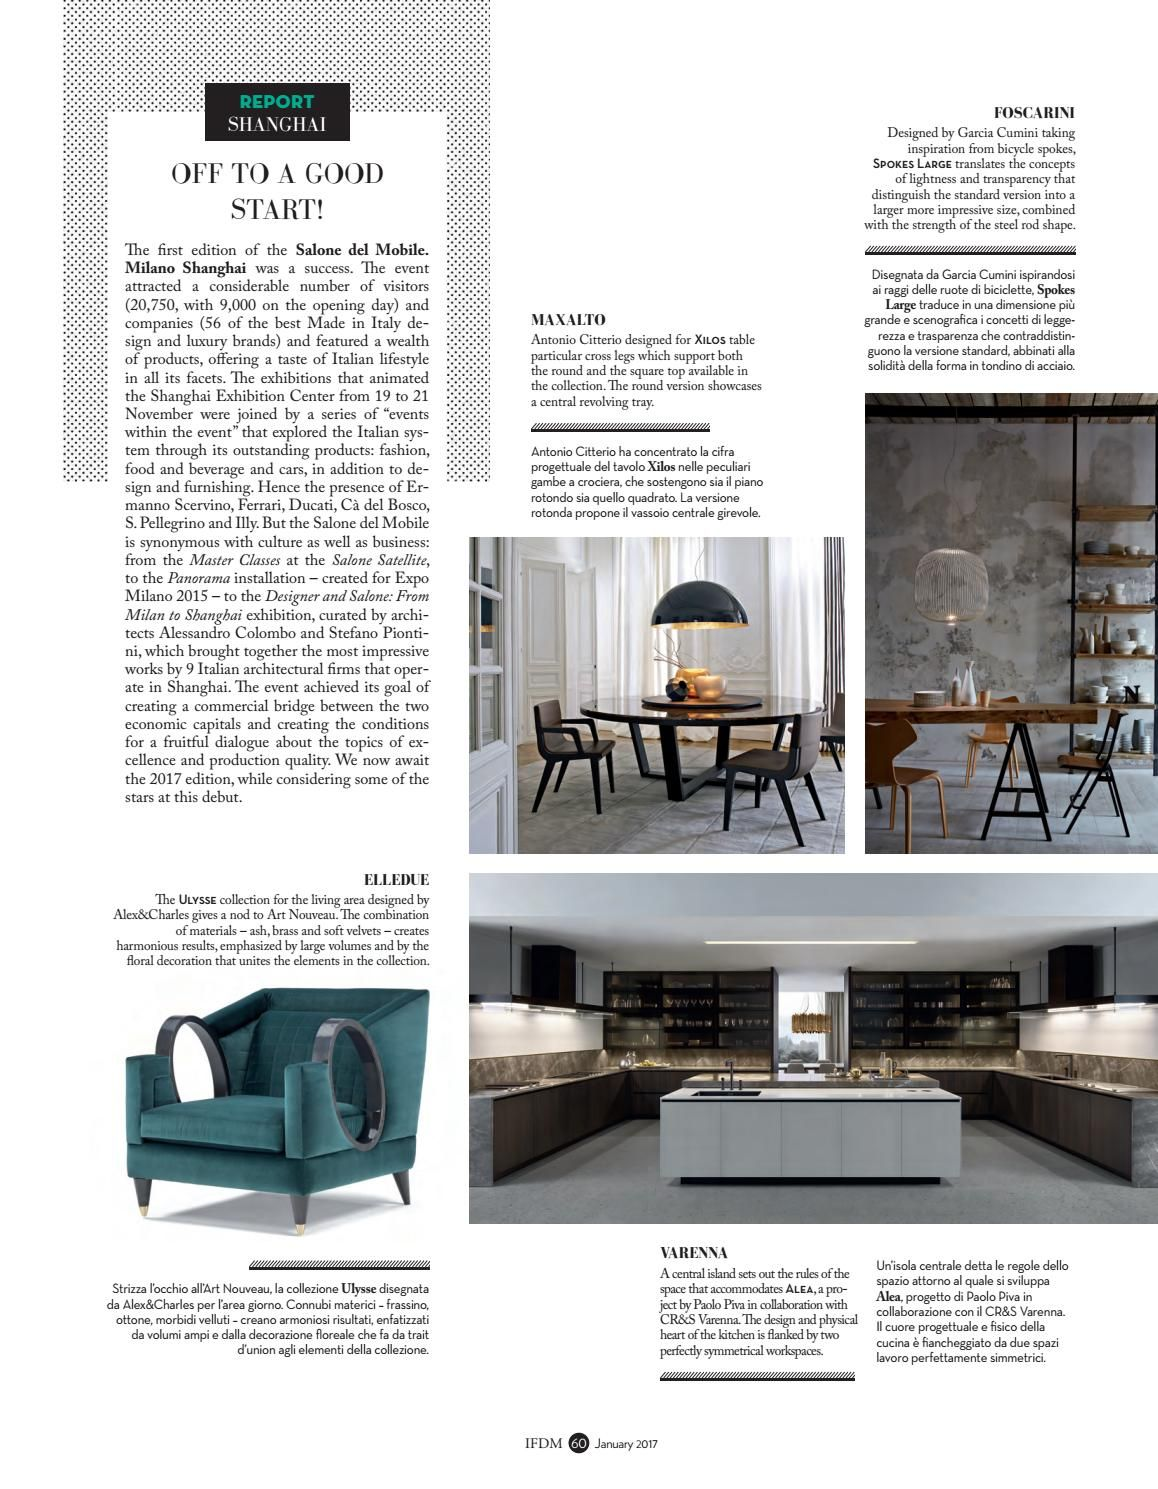 Dimensioni Standard Tavolo Cucina ifdm n. 1-2017 | metal shelves, design, europe